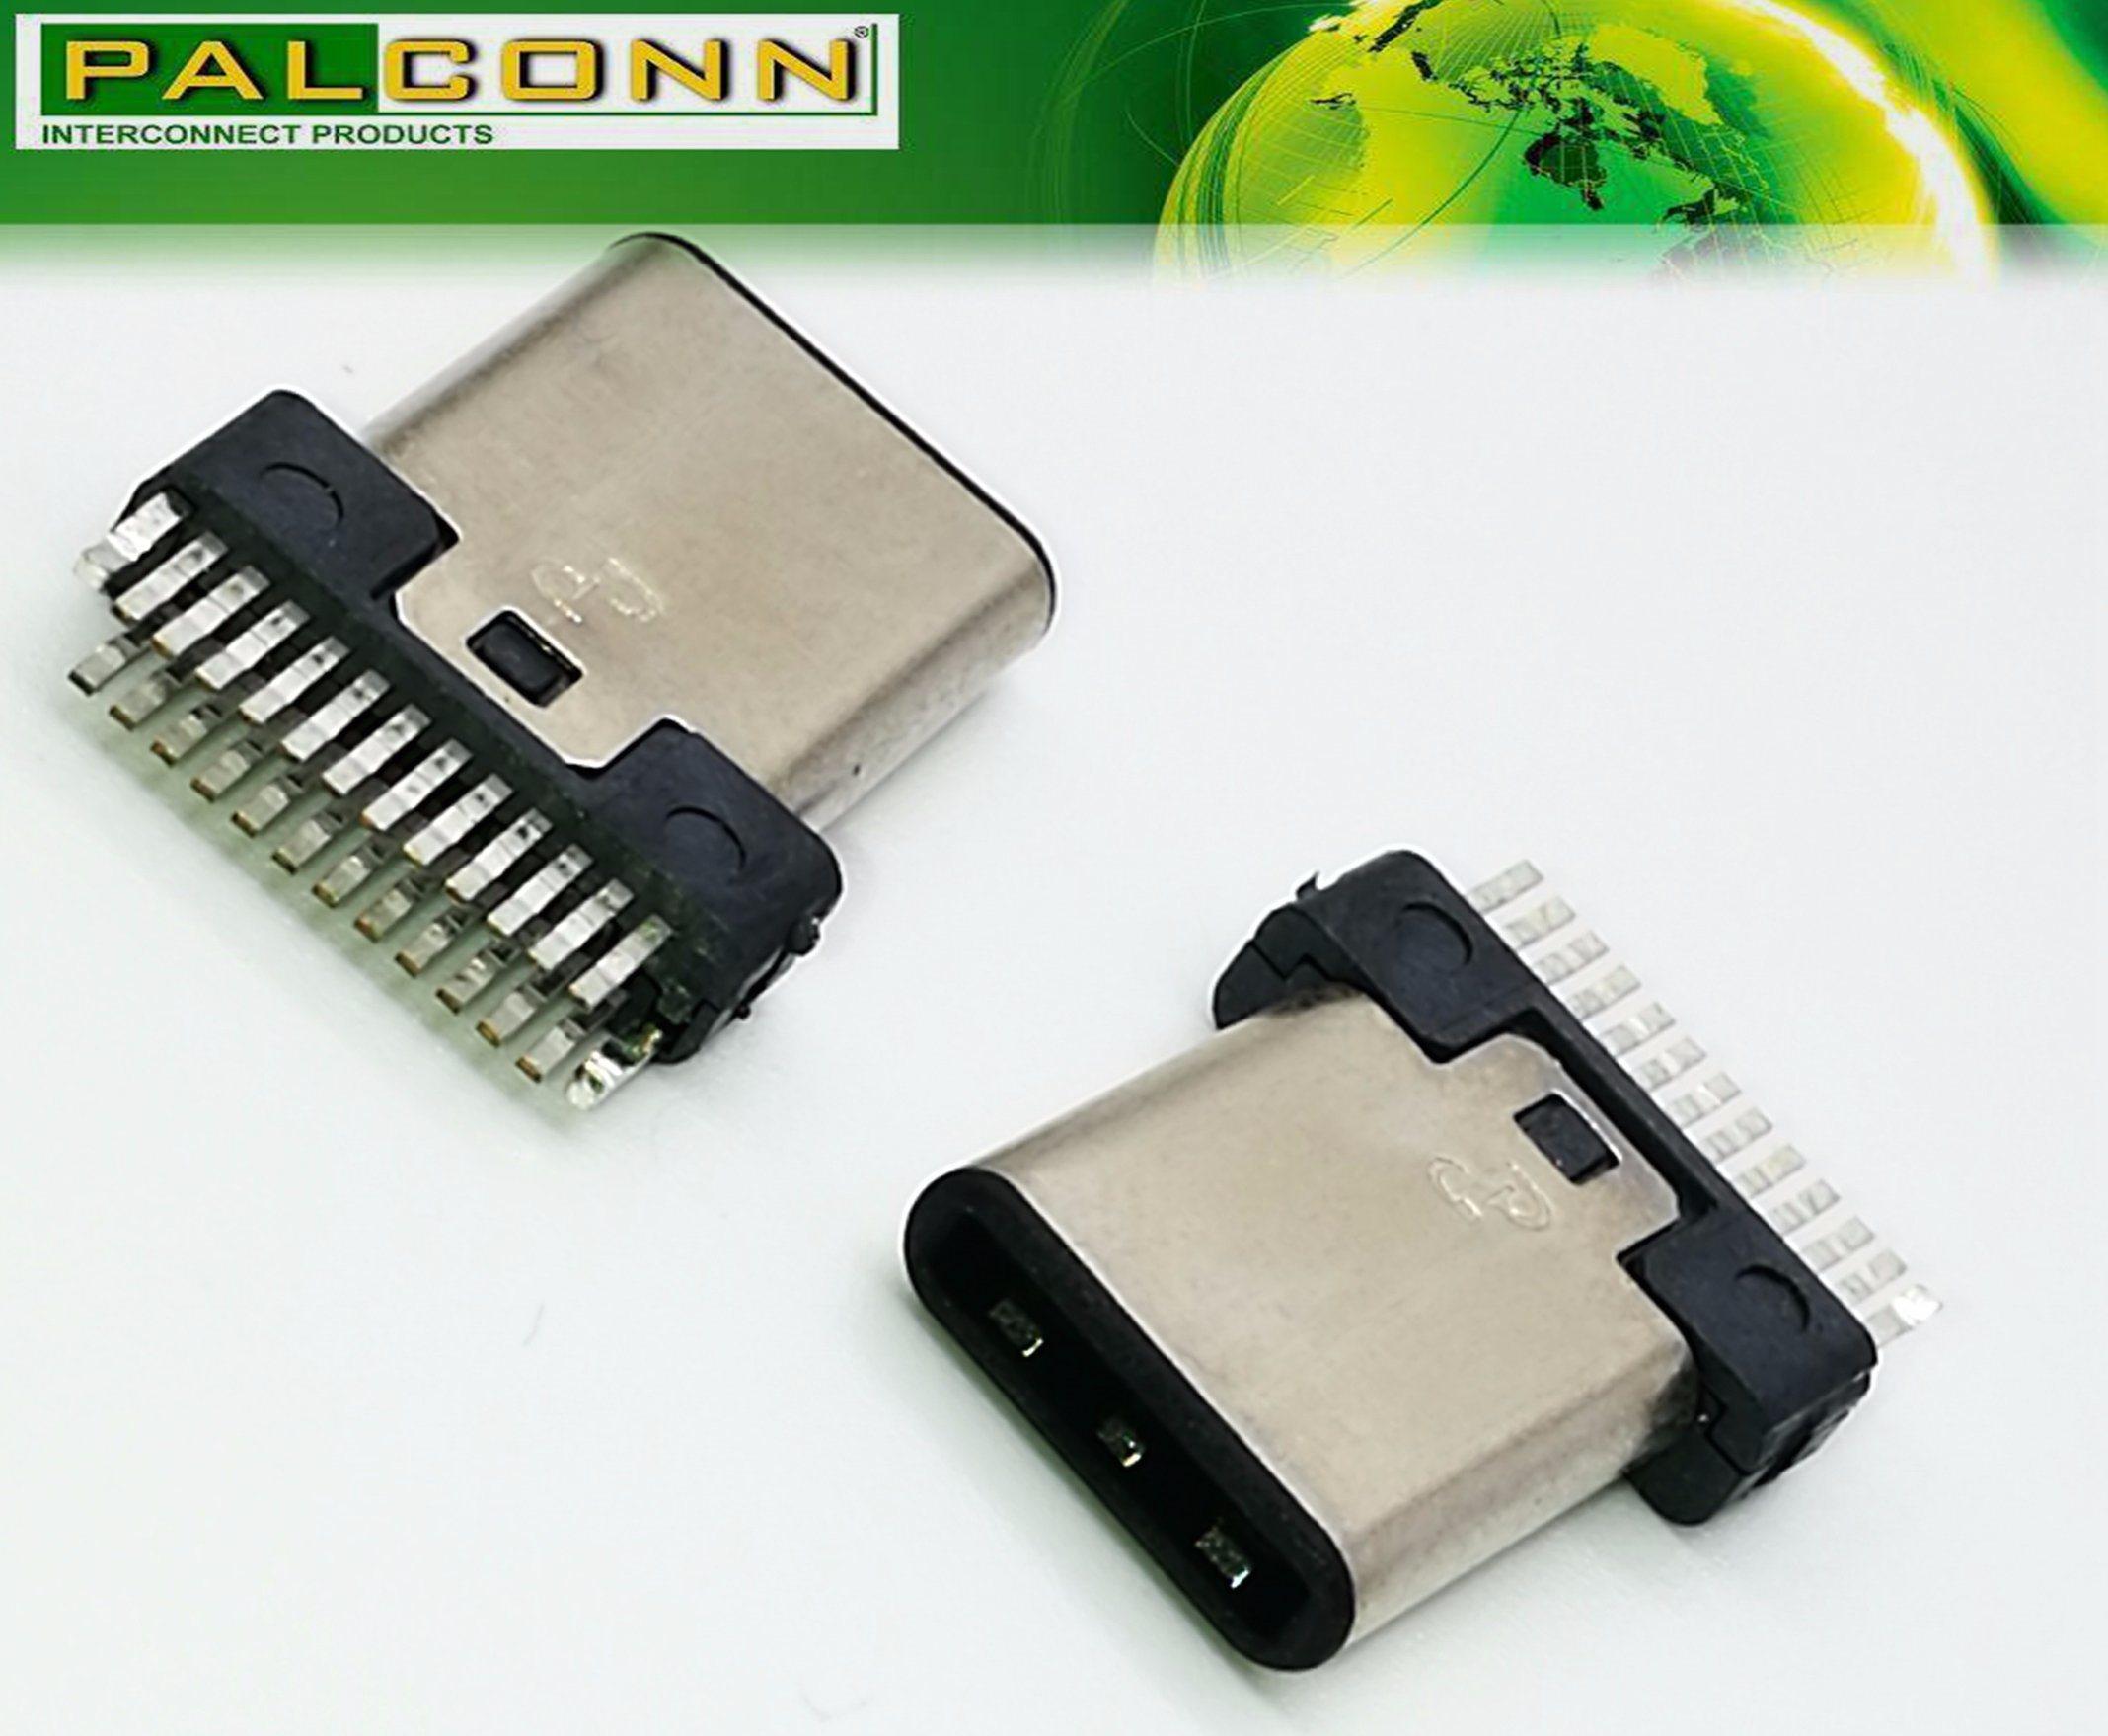 High Quality USB 3.1 Type C Male Plug 22 Pin USB-If Number: 5, 200, 000, 284